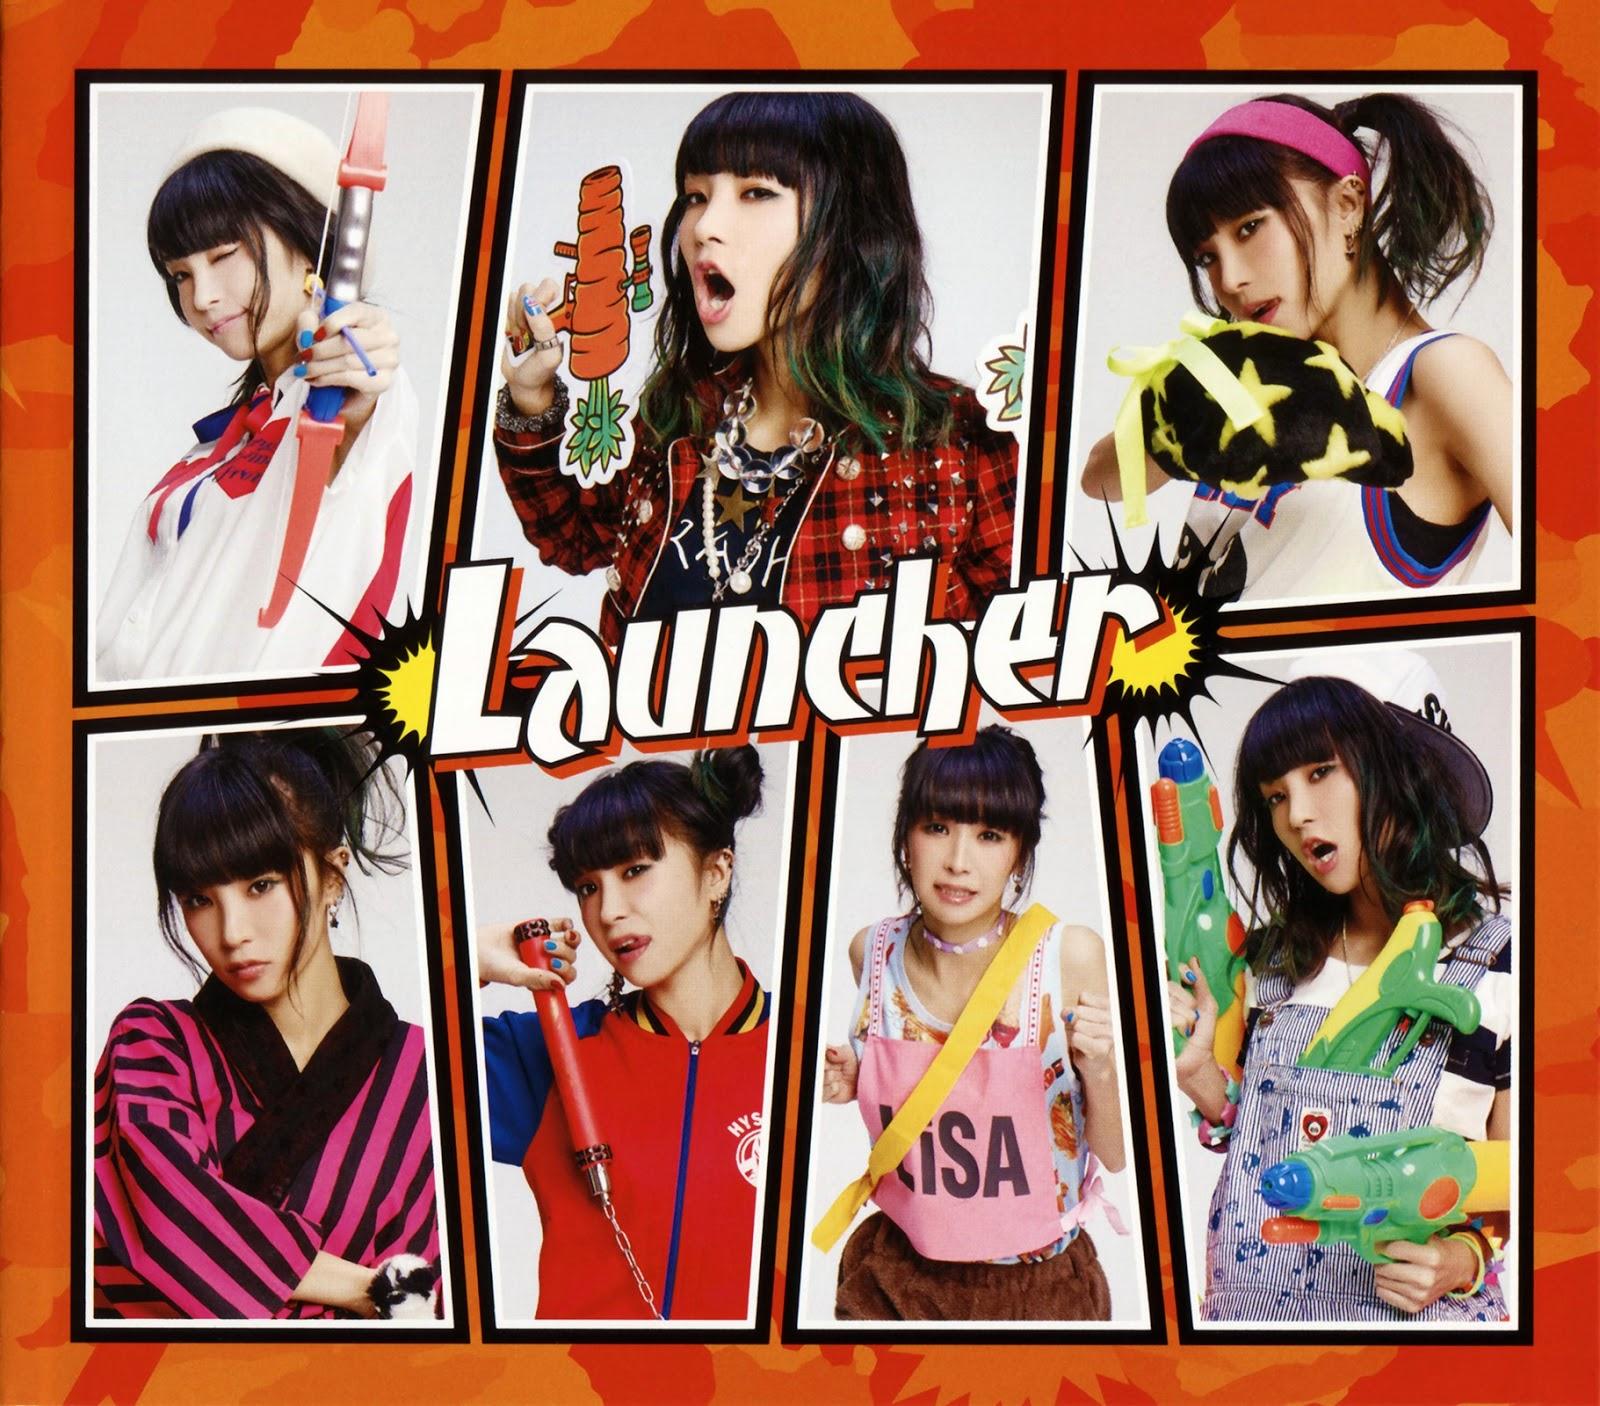 Download Mp3 Taki Taki Wapka Mobi: [Full Album] Download Lagu LiSA Album Launcher (2015) (Mp3